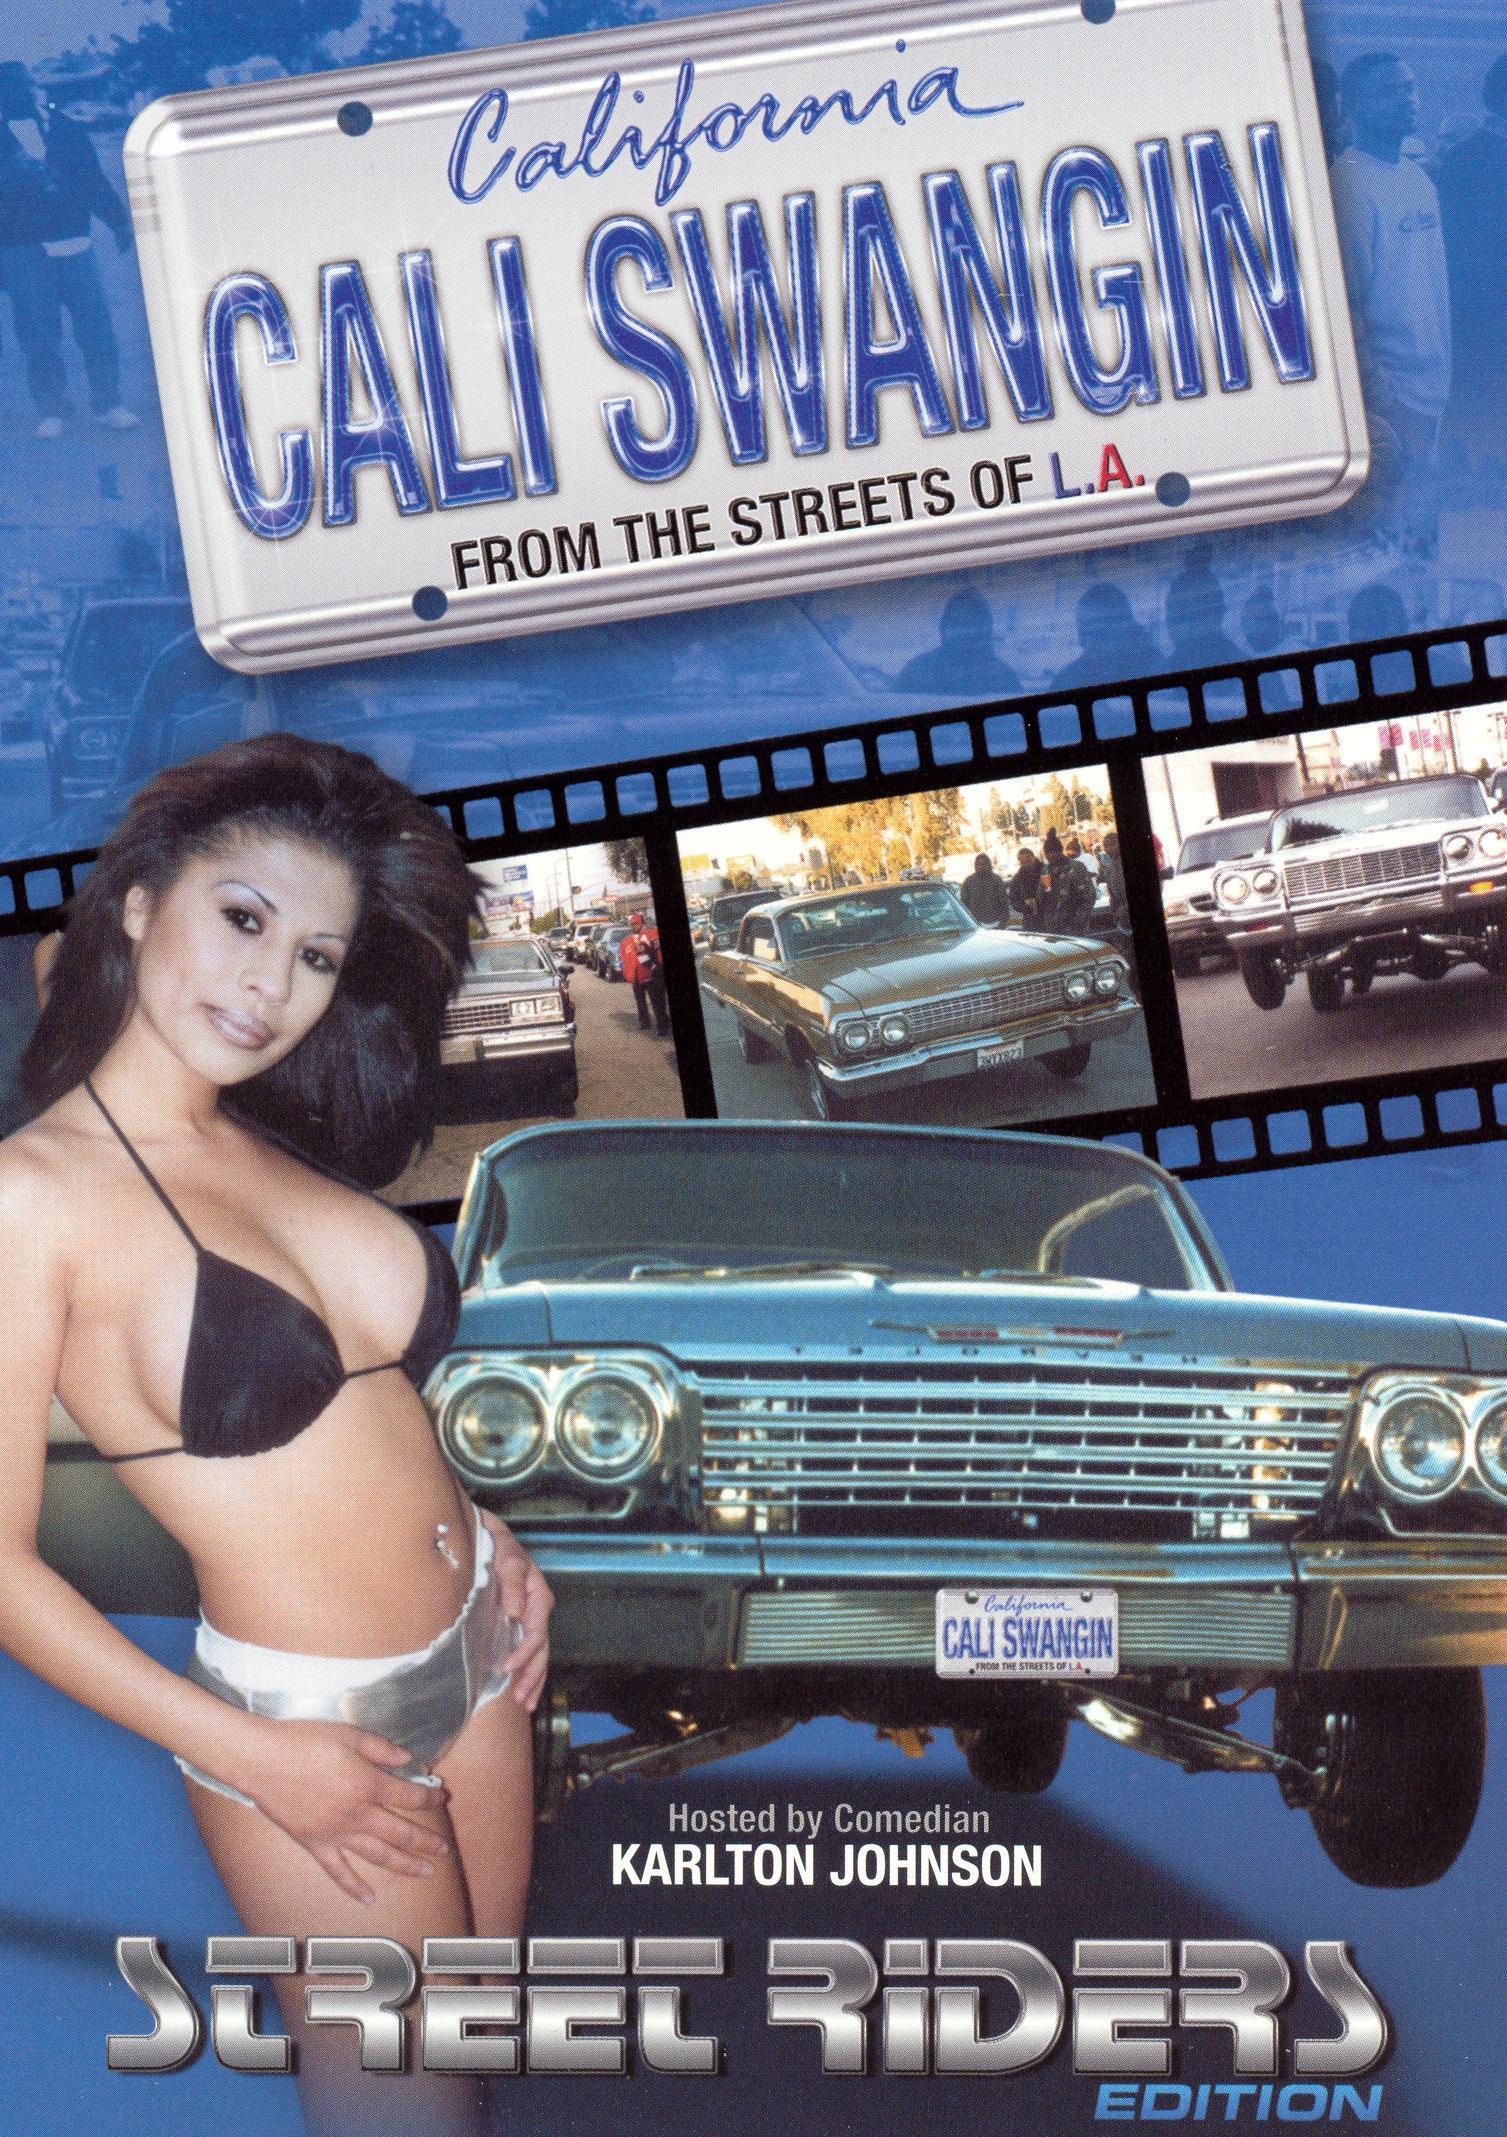 Cali Swangin': Street Riders